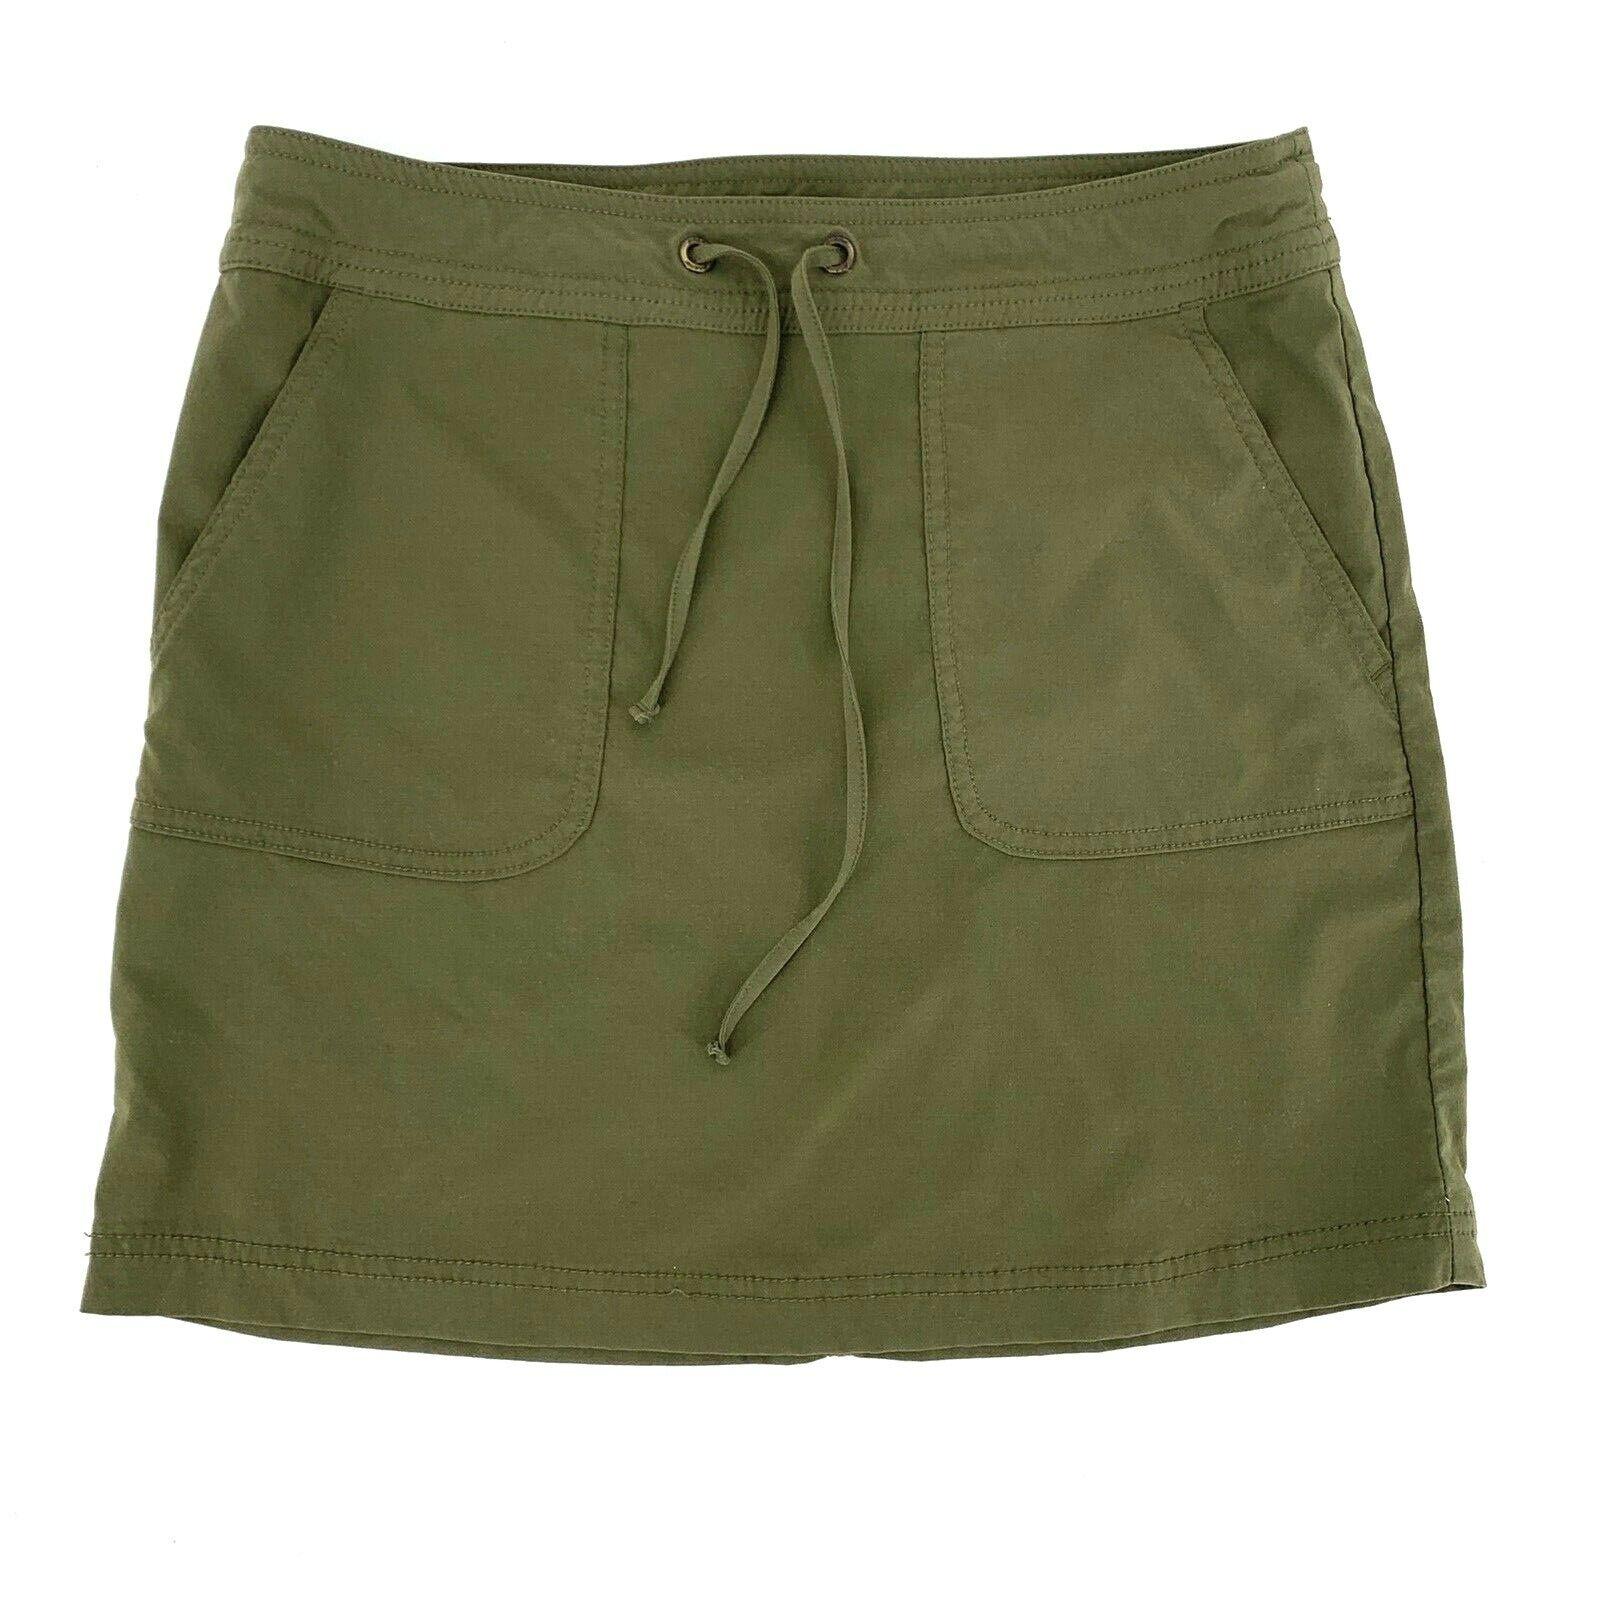 PRANA Bliss Skirt Women's Green Nylon Spandex Drawstring Waist Active A-Line XS